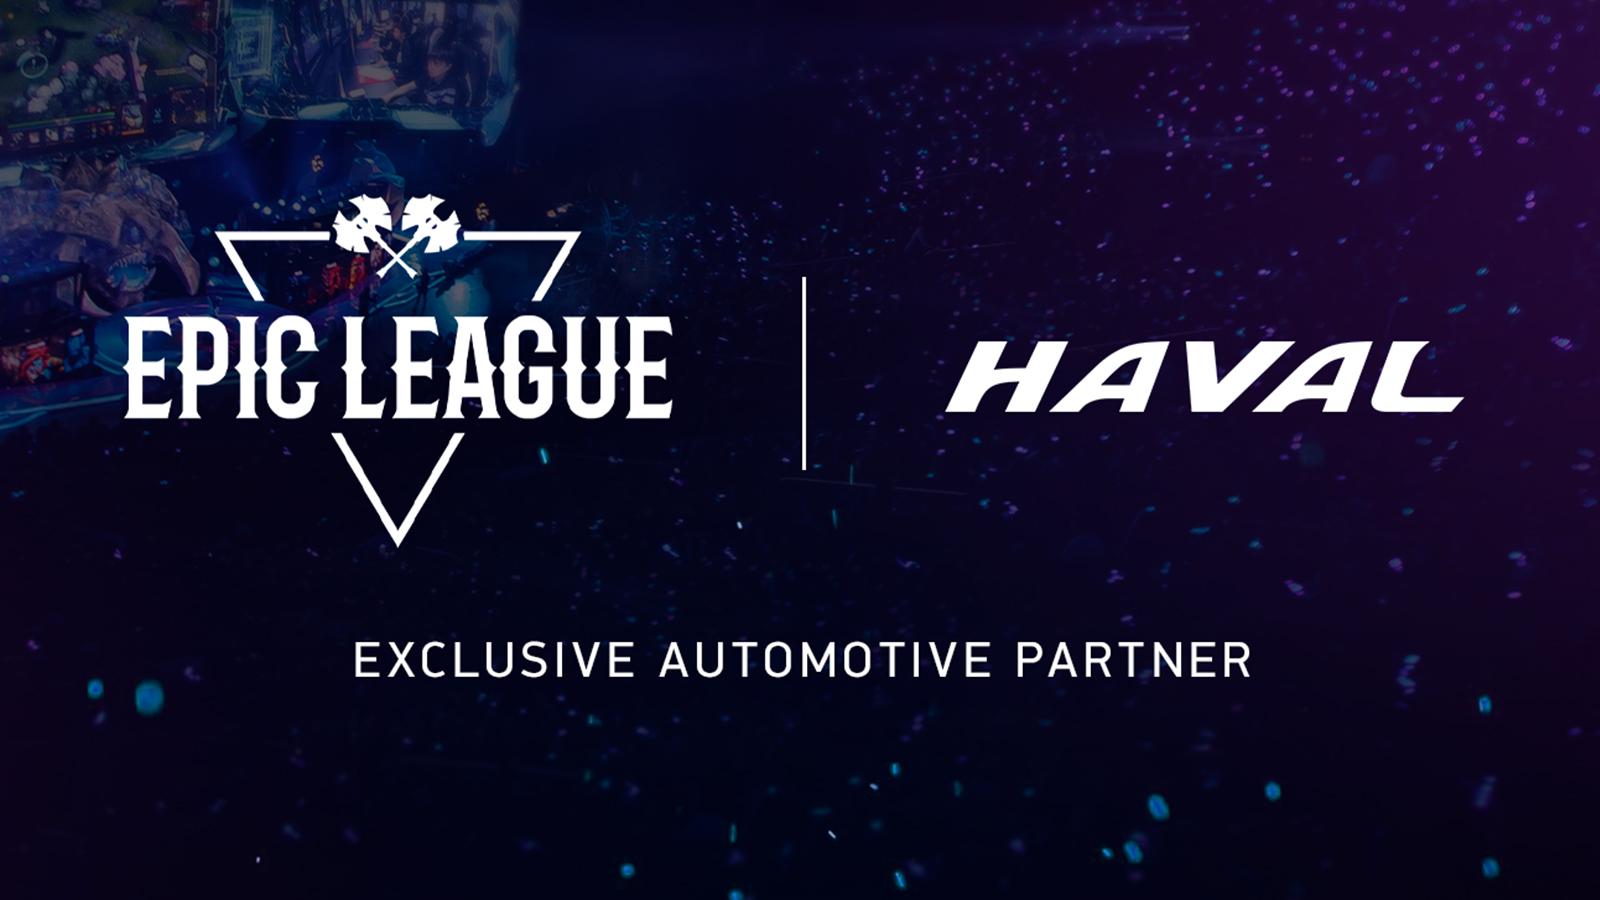 EPIC League Season 2 Haval